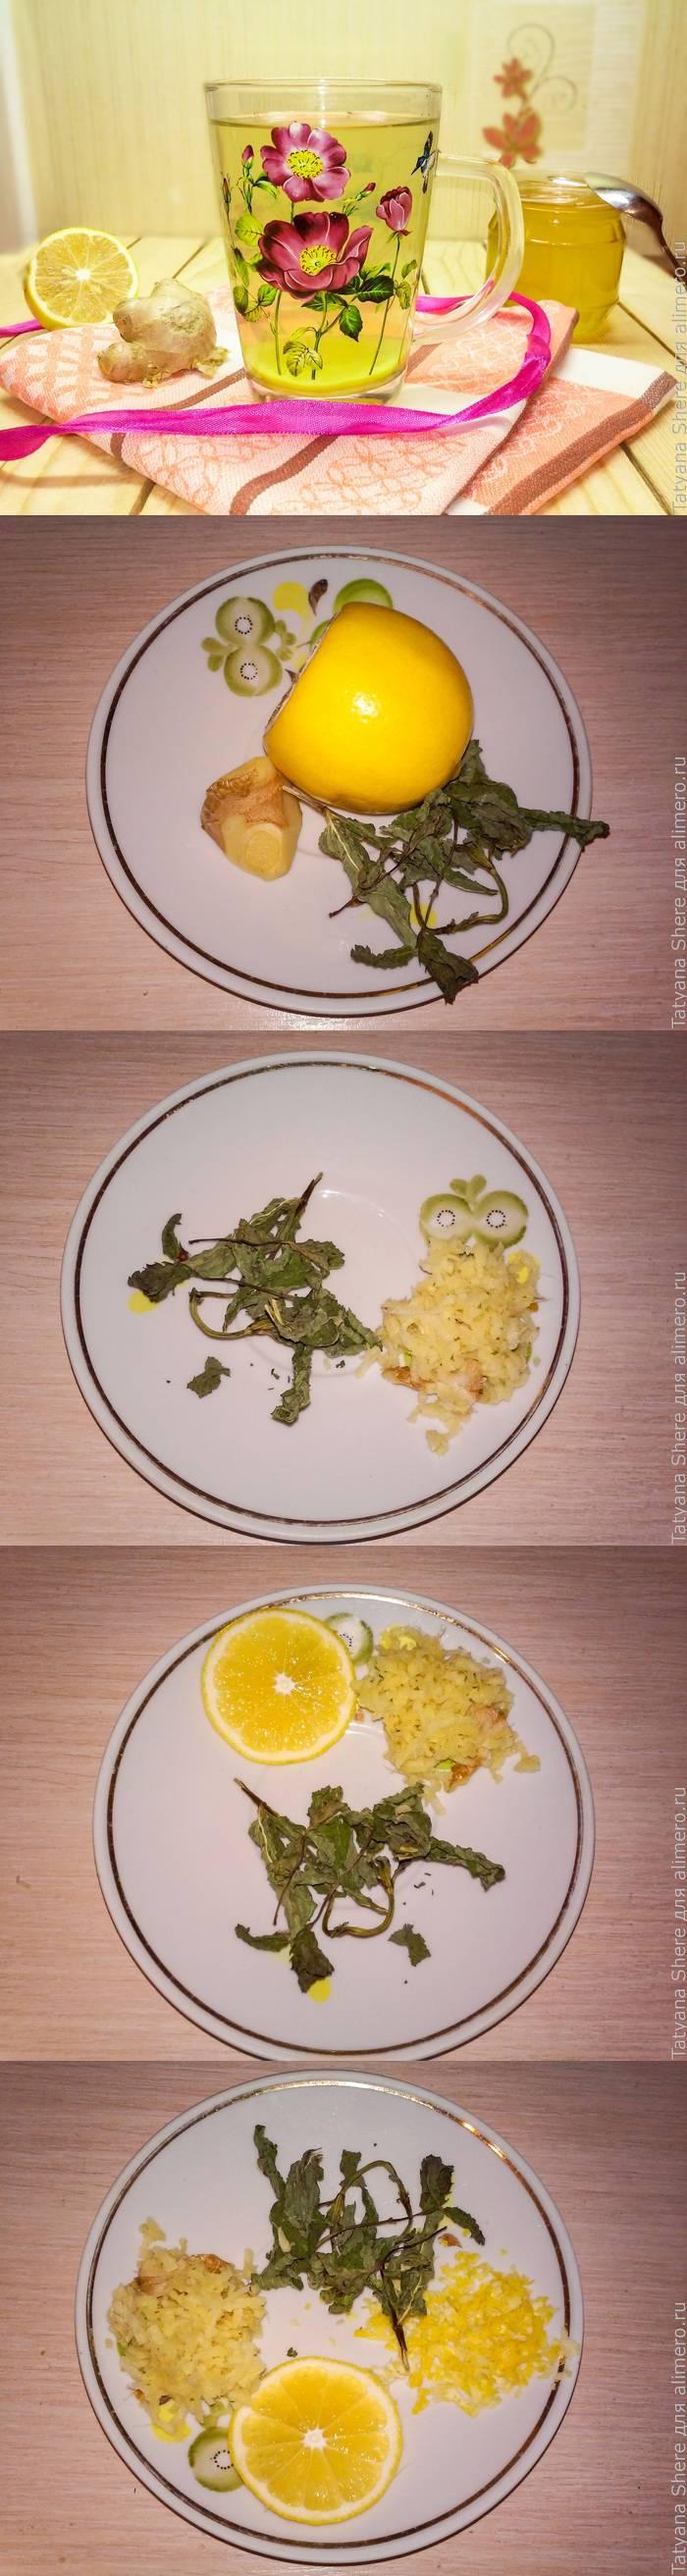 Сбитень имбирно-лимонный